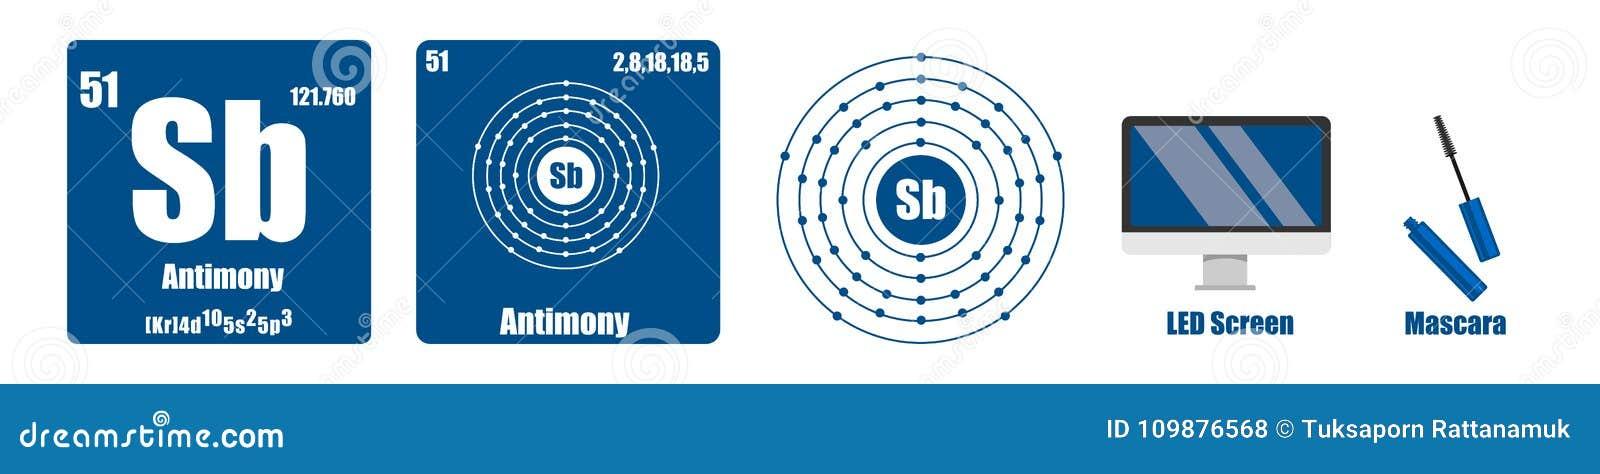 Periodic table of element group v antimony stock illustration download periodic table of element group v antimony stock illustration illustration of symbol chemistry urtaz Gallery